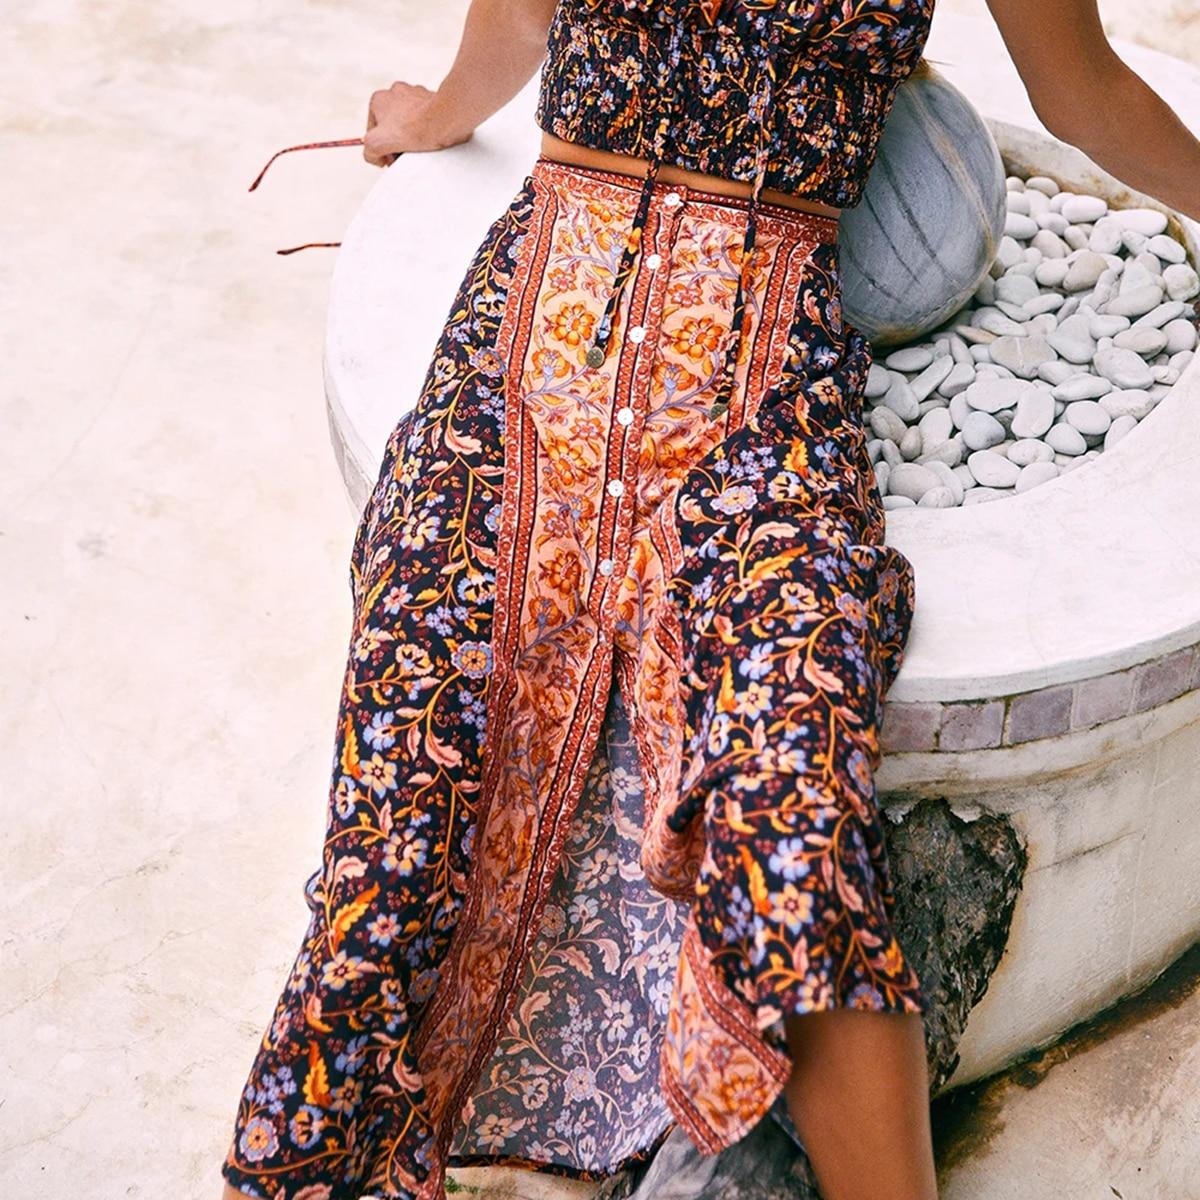 Daisy Chain Maxi Skirt Women Cotton High Waist Elastic Split Skirts Female Faldas 2020 Summer Boho Beach Vintage Long Skirt